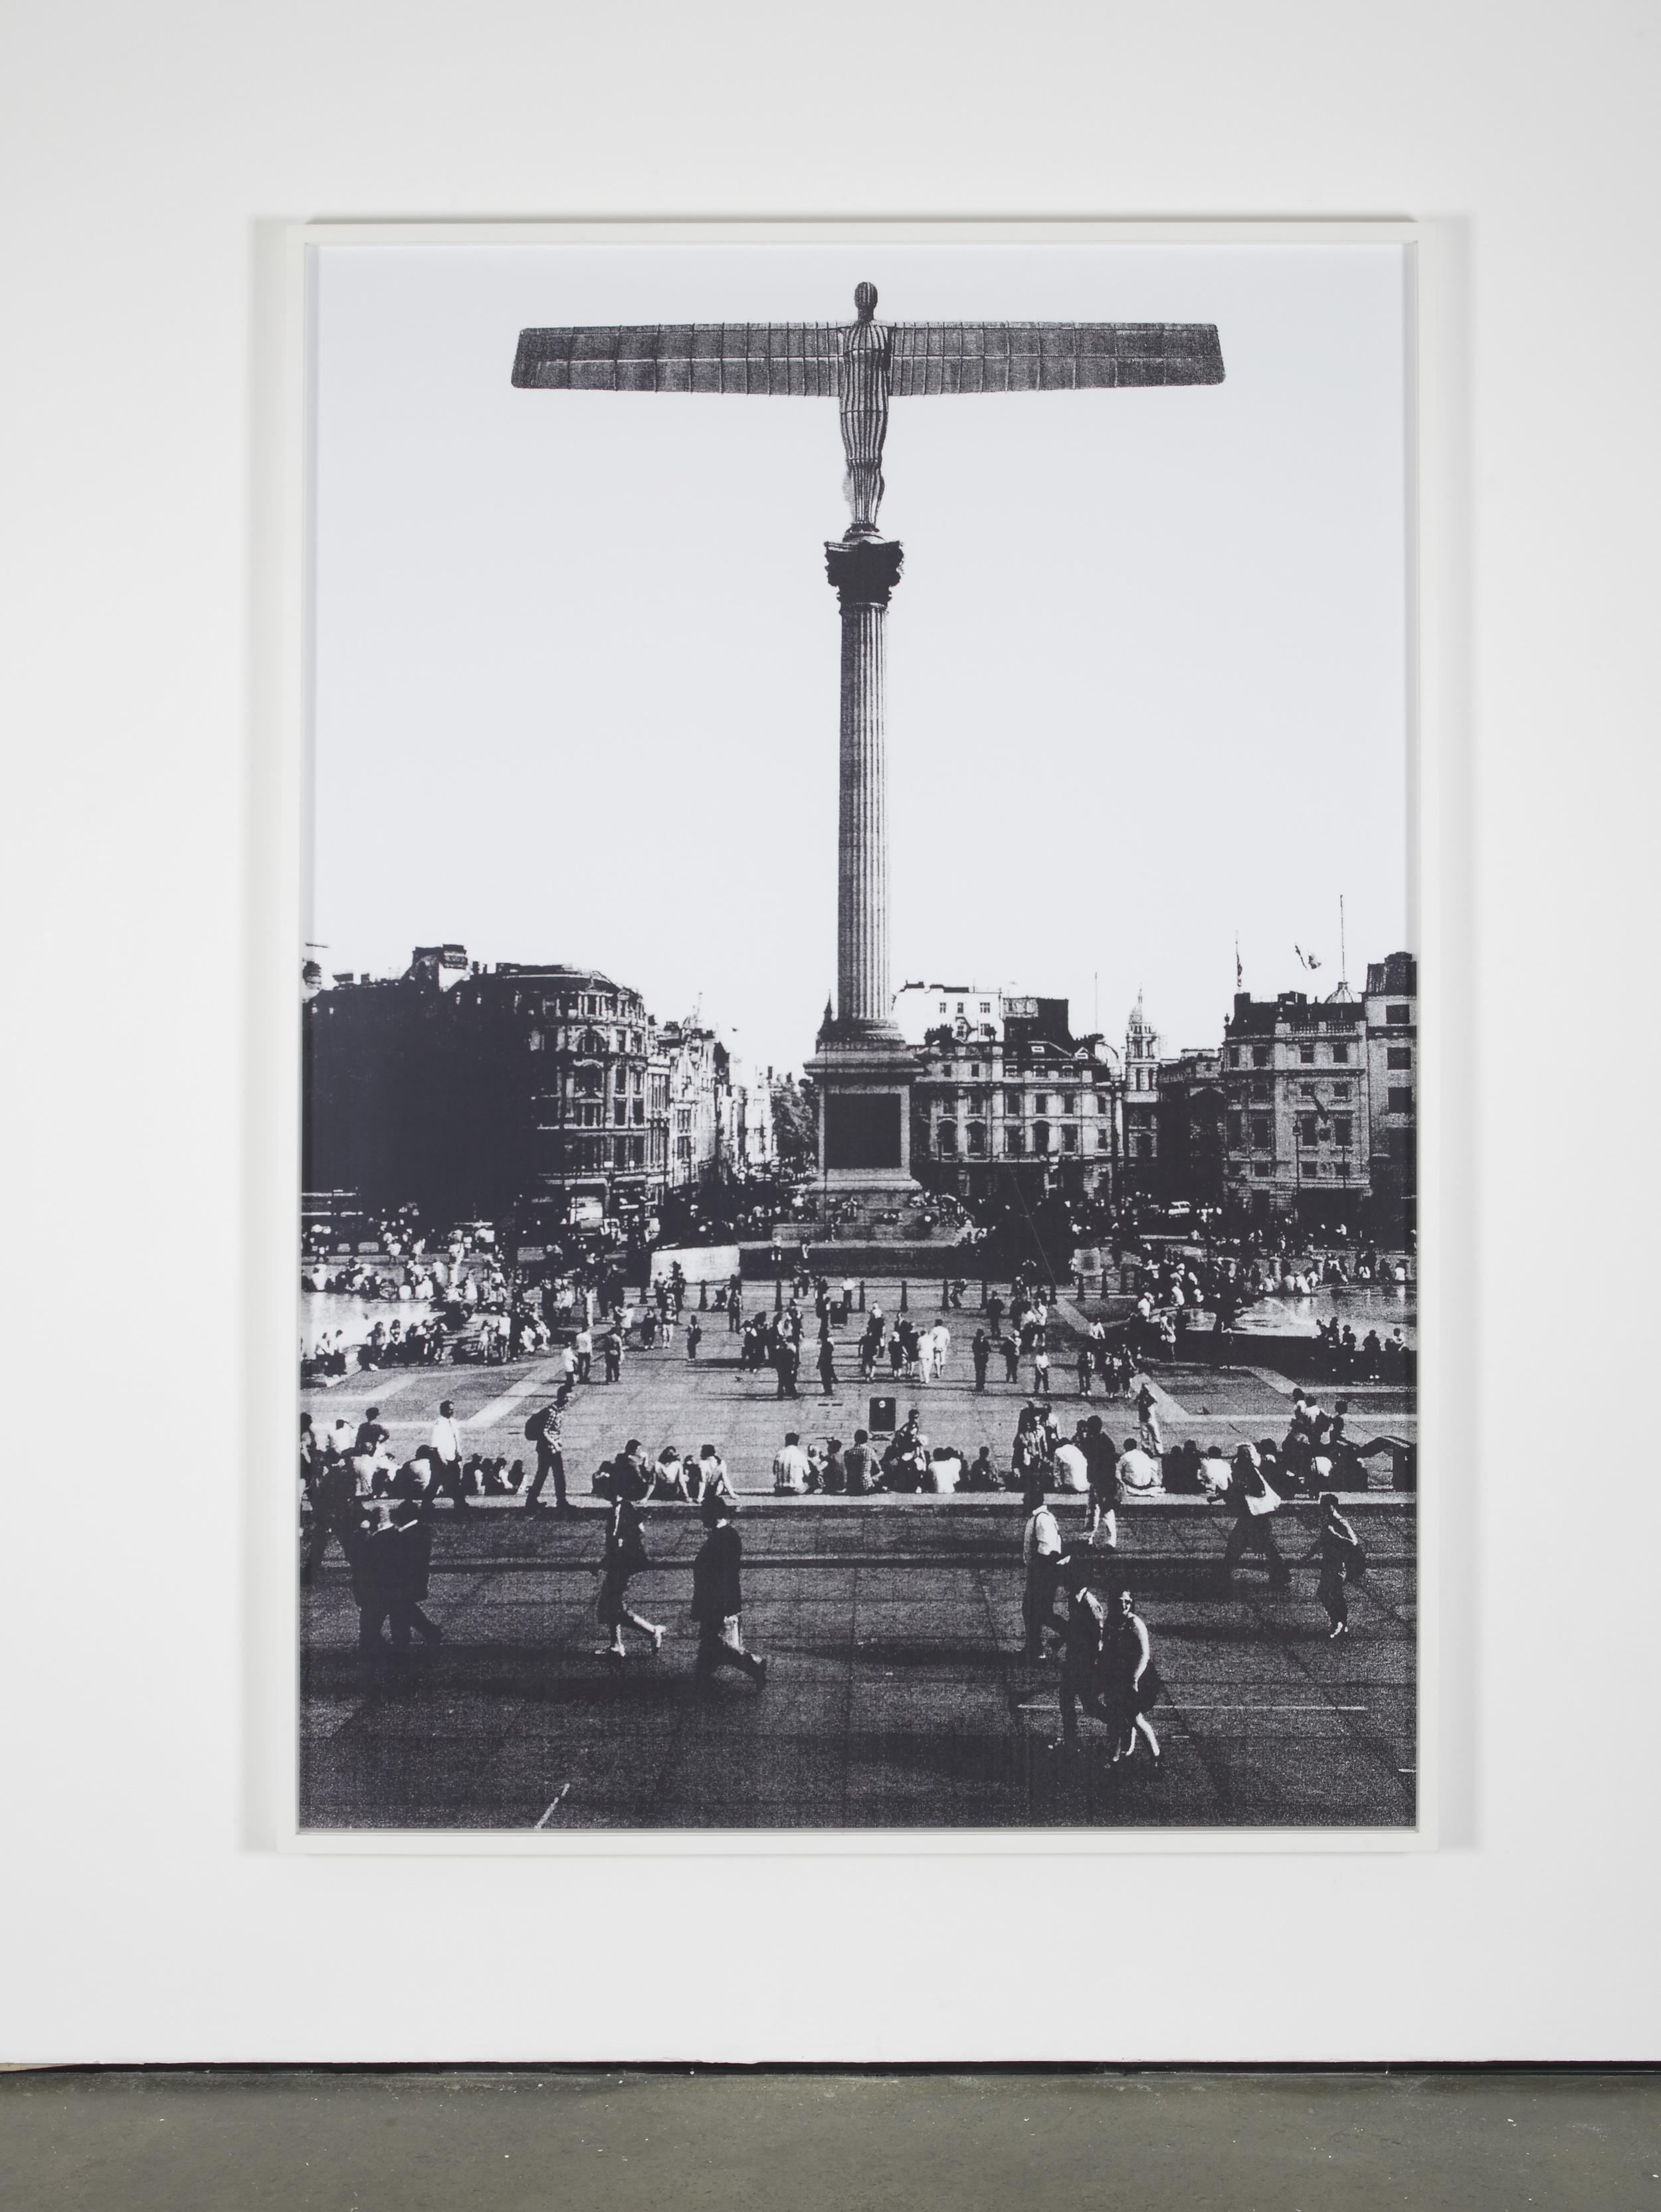 Long Live Death   2012   Inkjet print   219 x 150 cm / 86.2 x 59 in